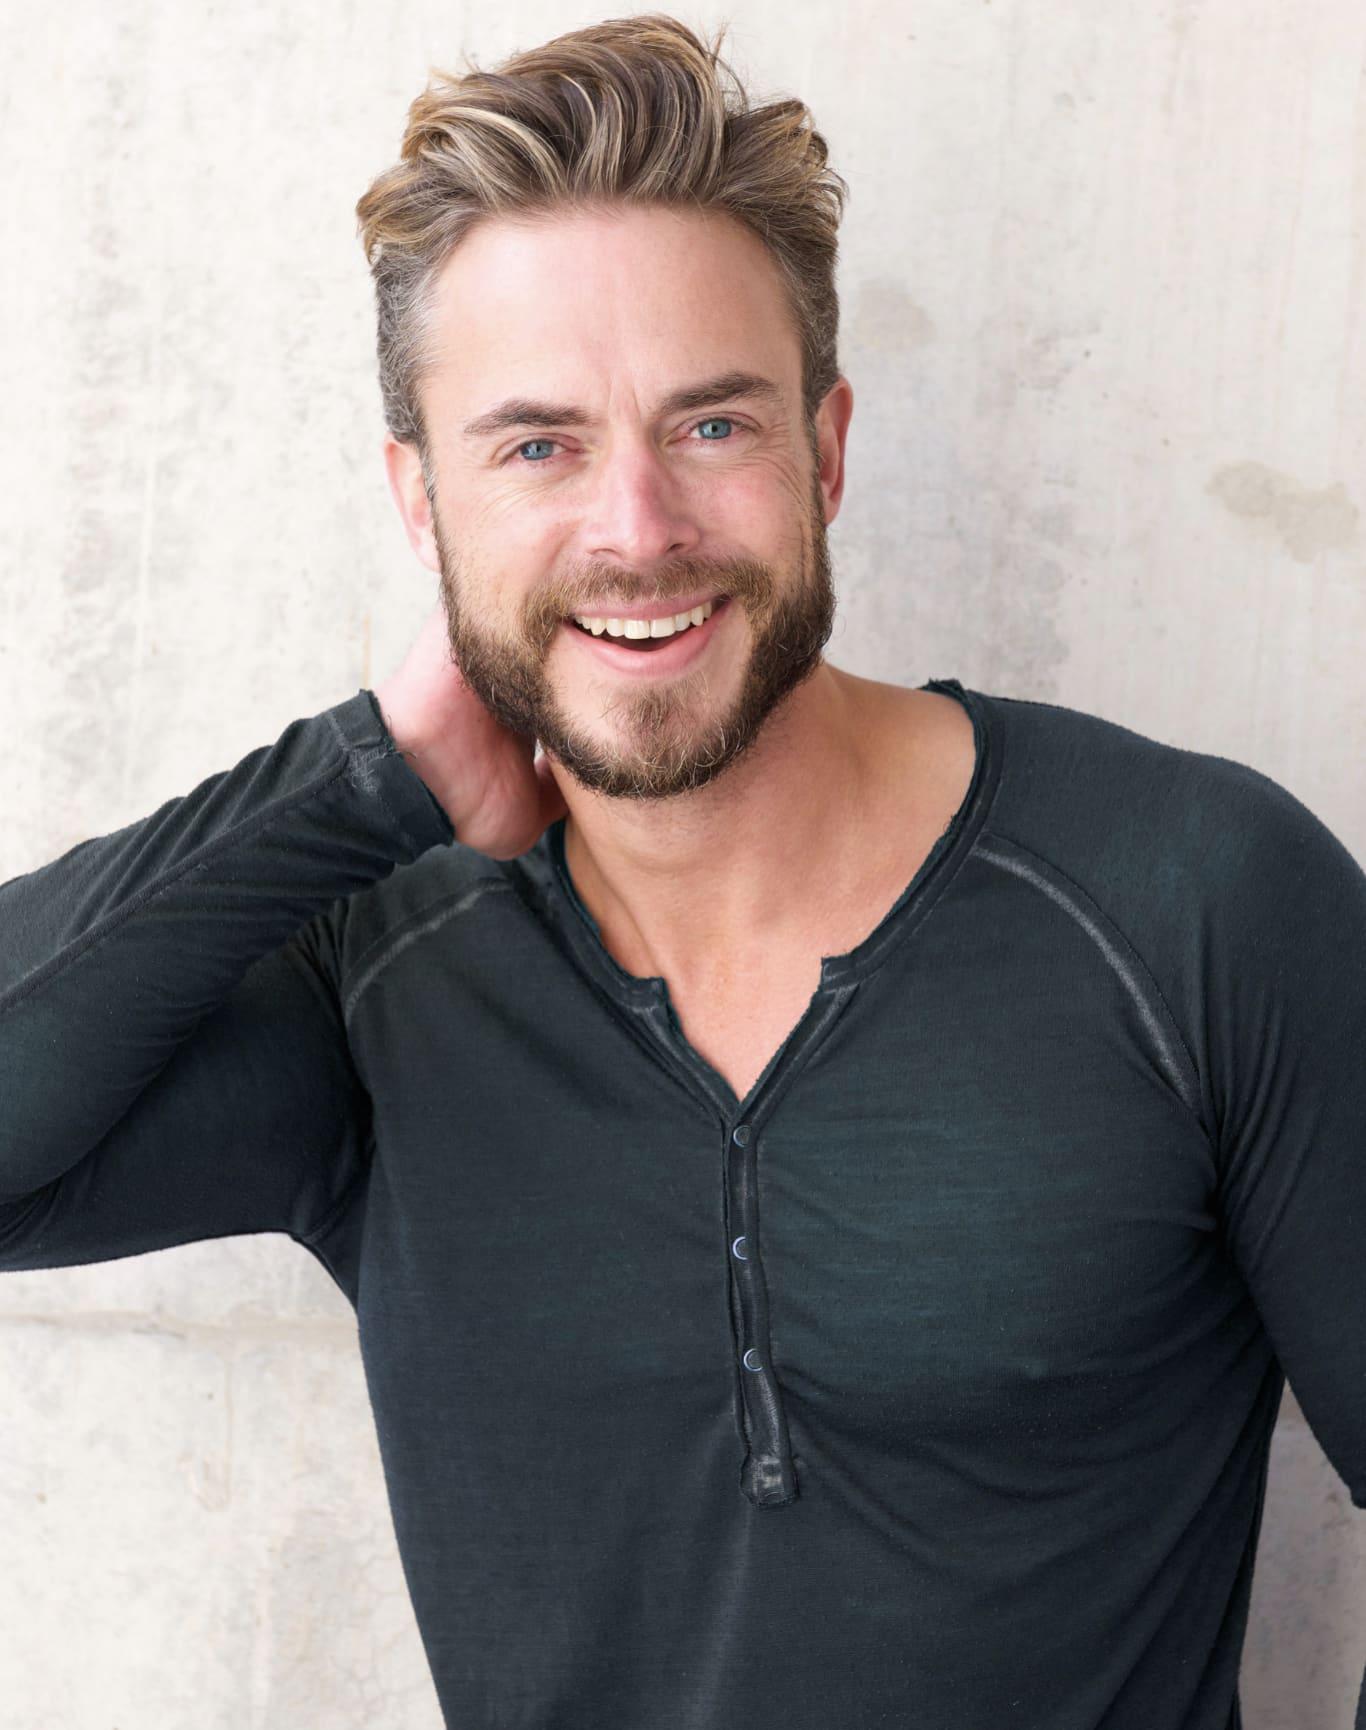 Smiling man wearing a black henley shirt